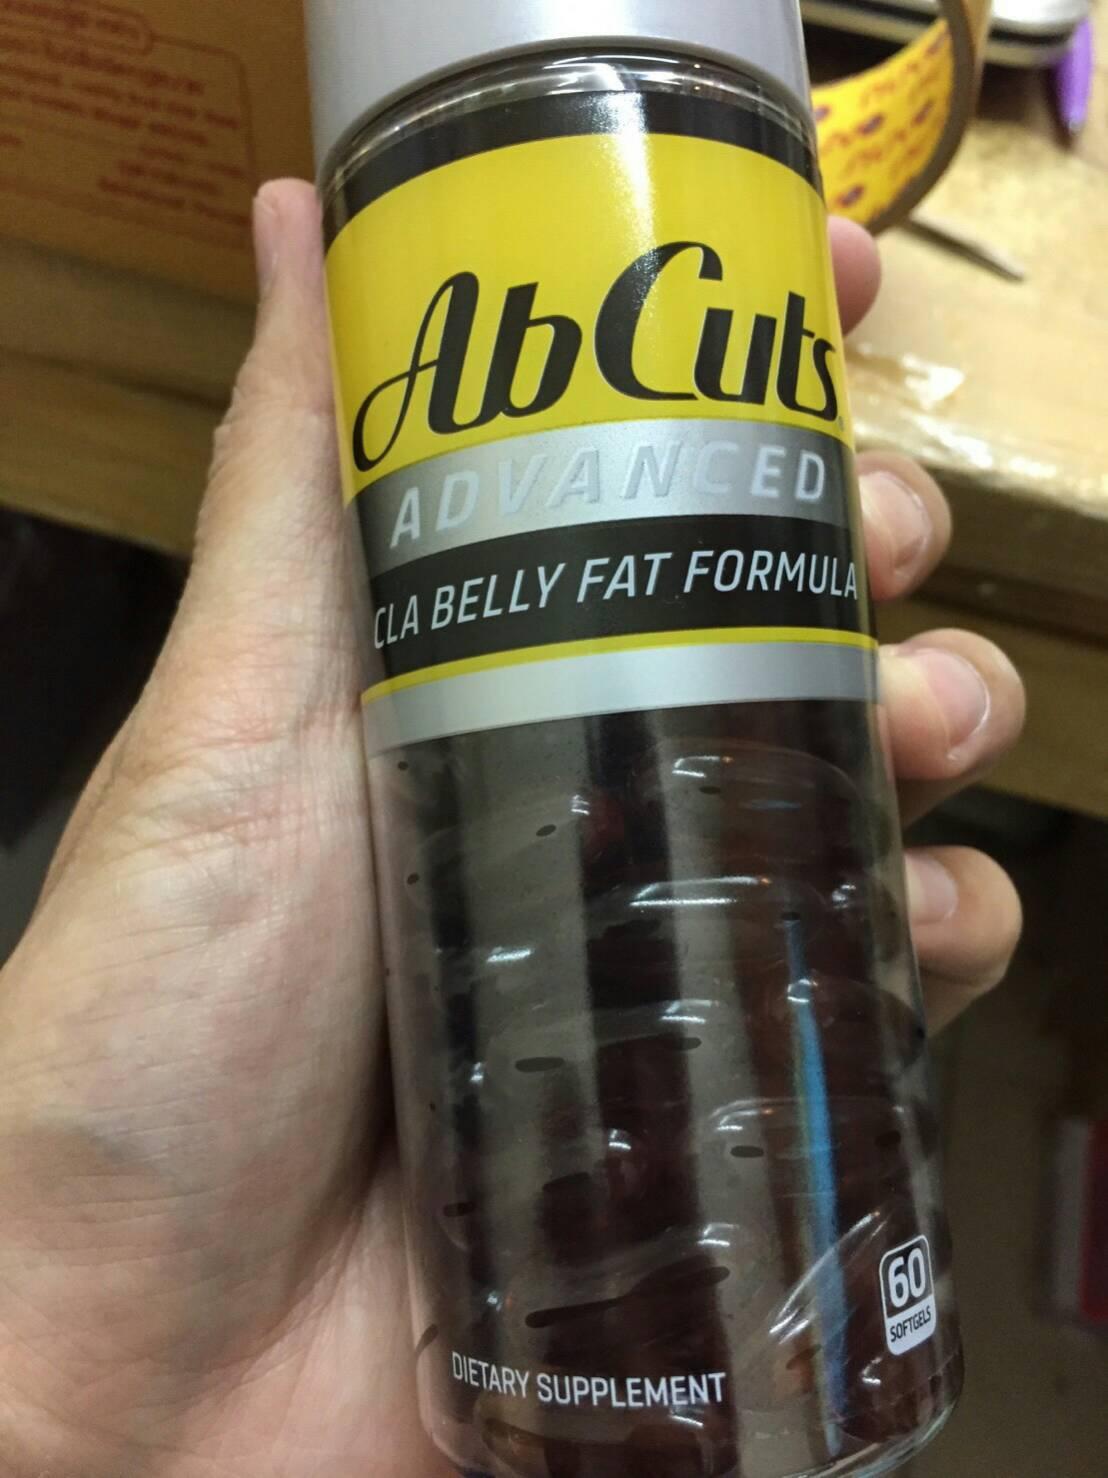 Ab Cuts Advanced CLA Belly Fat Formulas เผาผลาญไขมัน กระชับสัดส่วน 60 softgel